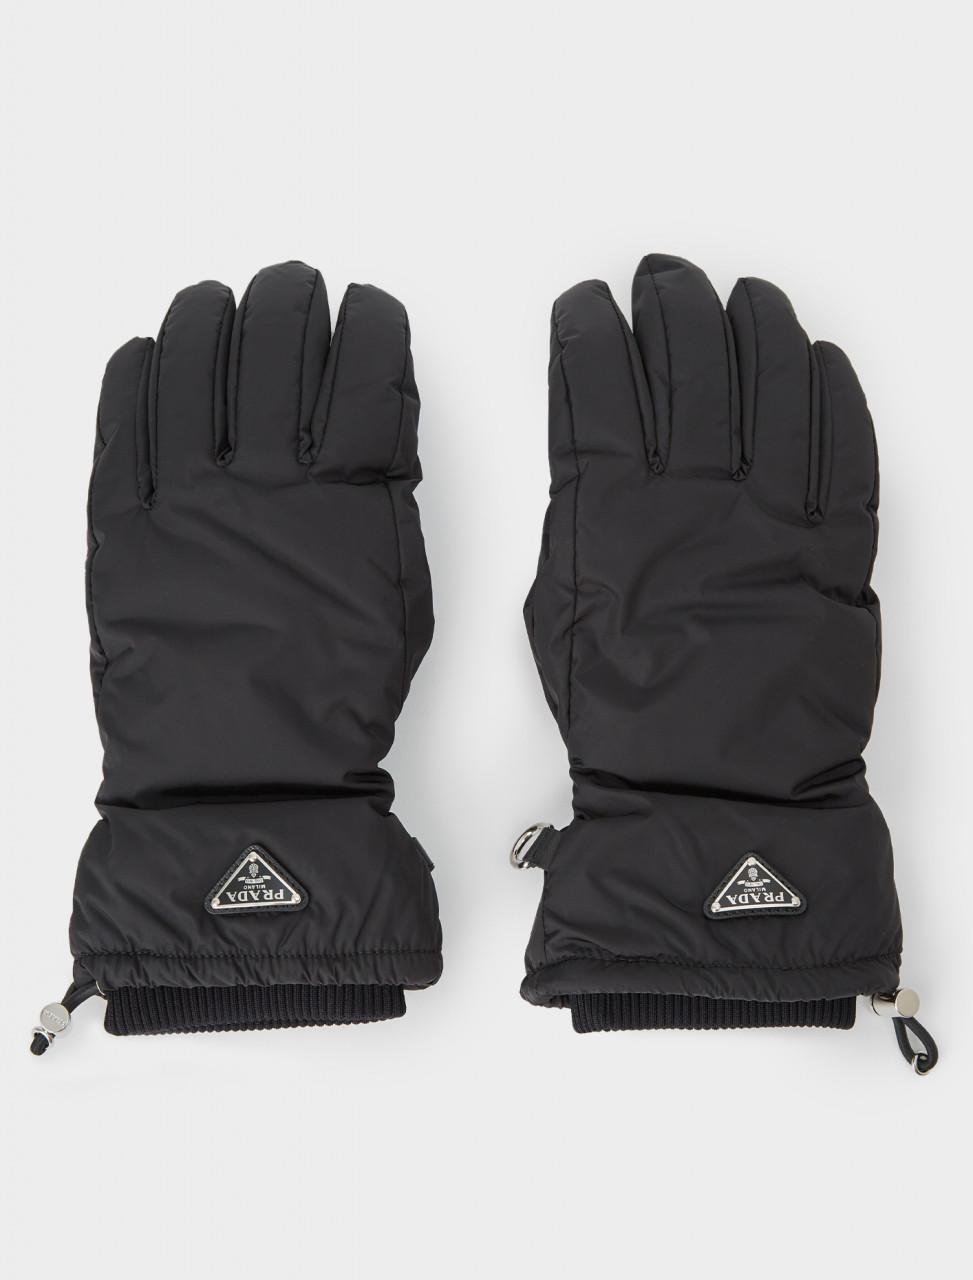 242-2GG092-Q04-F0002 PRADA Black Nylon Ski Gloves with Leather Inserts